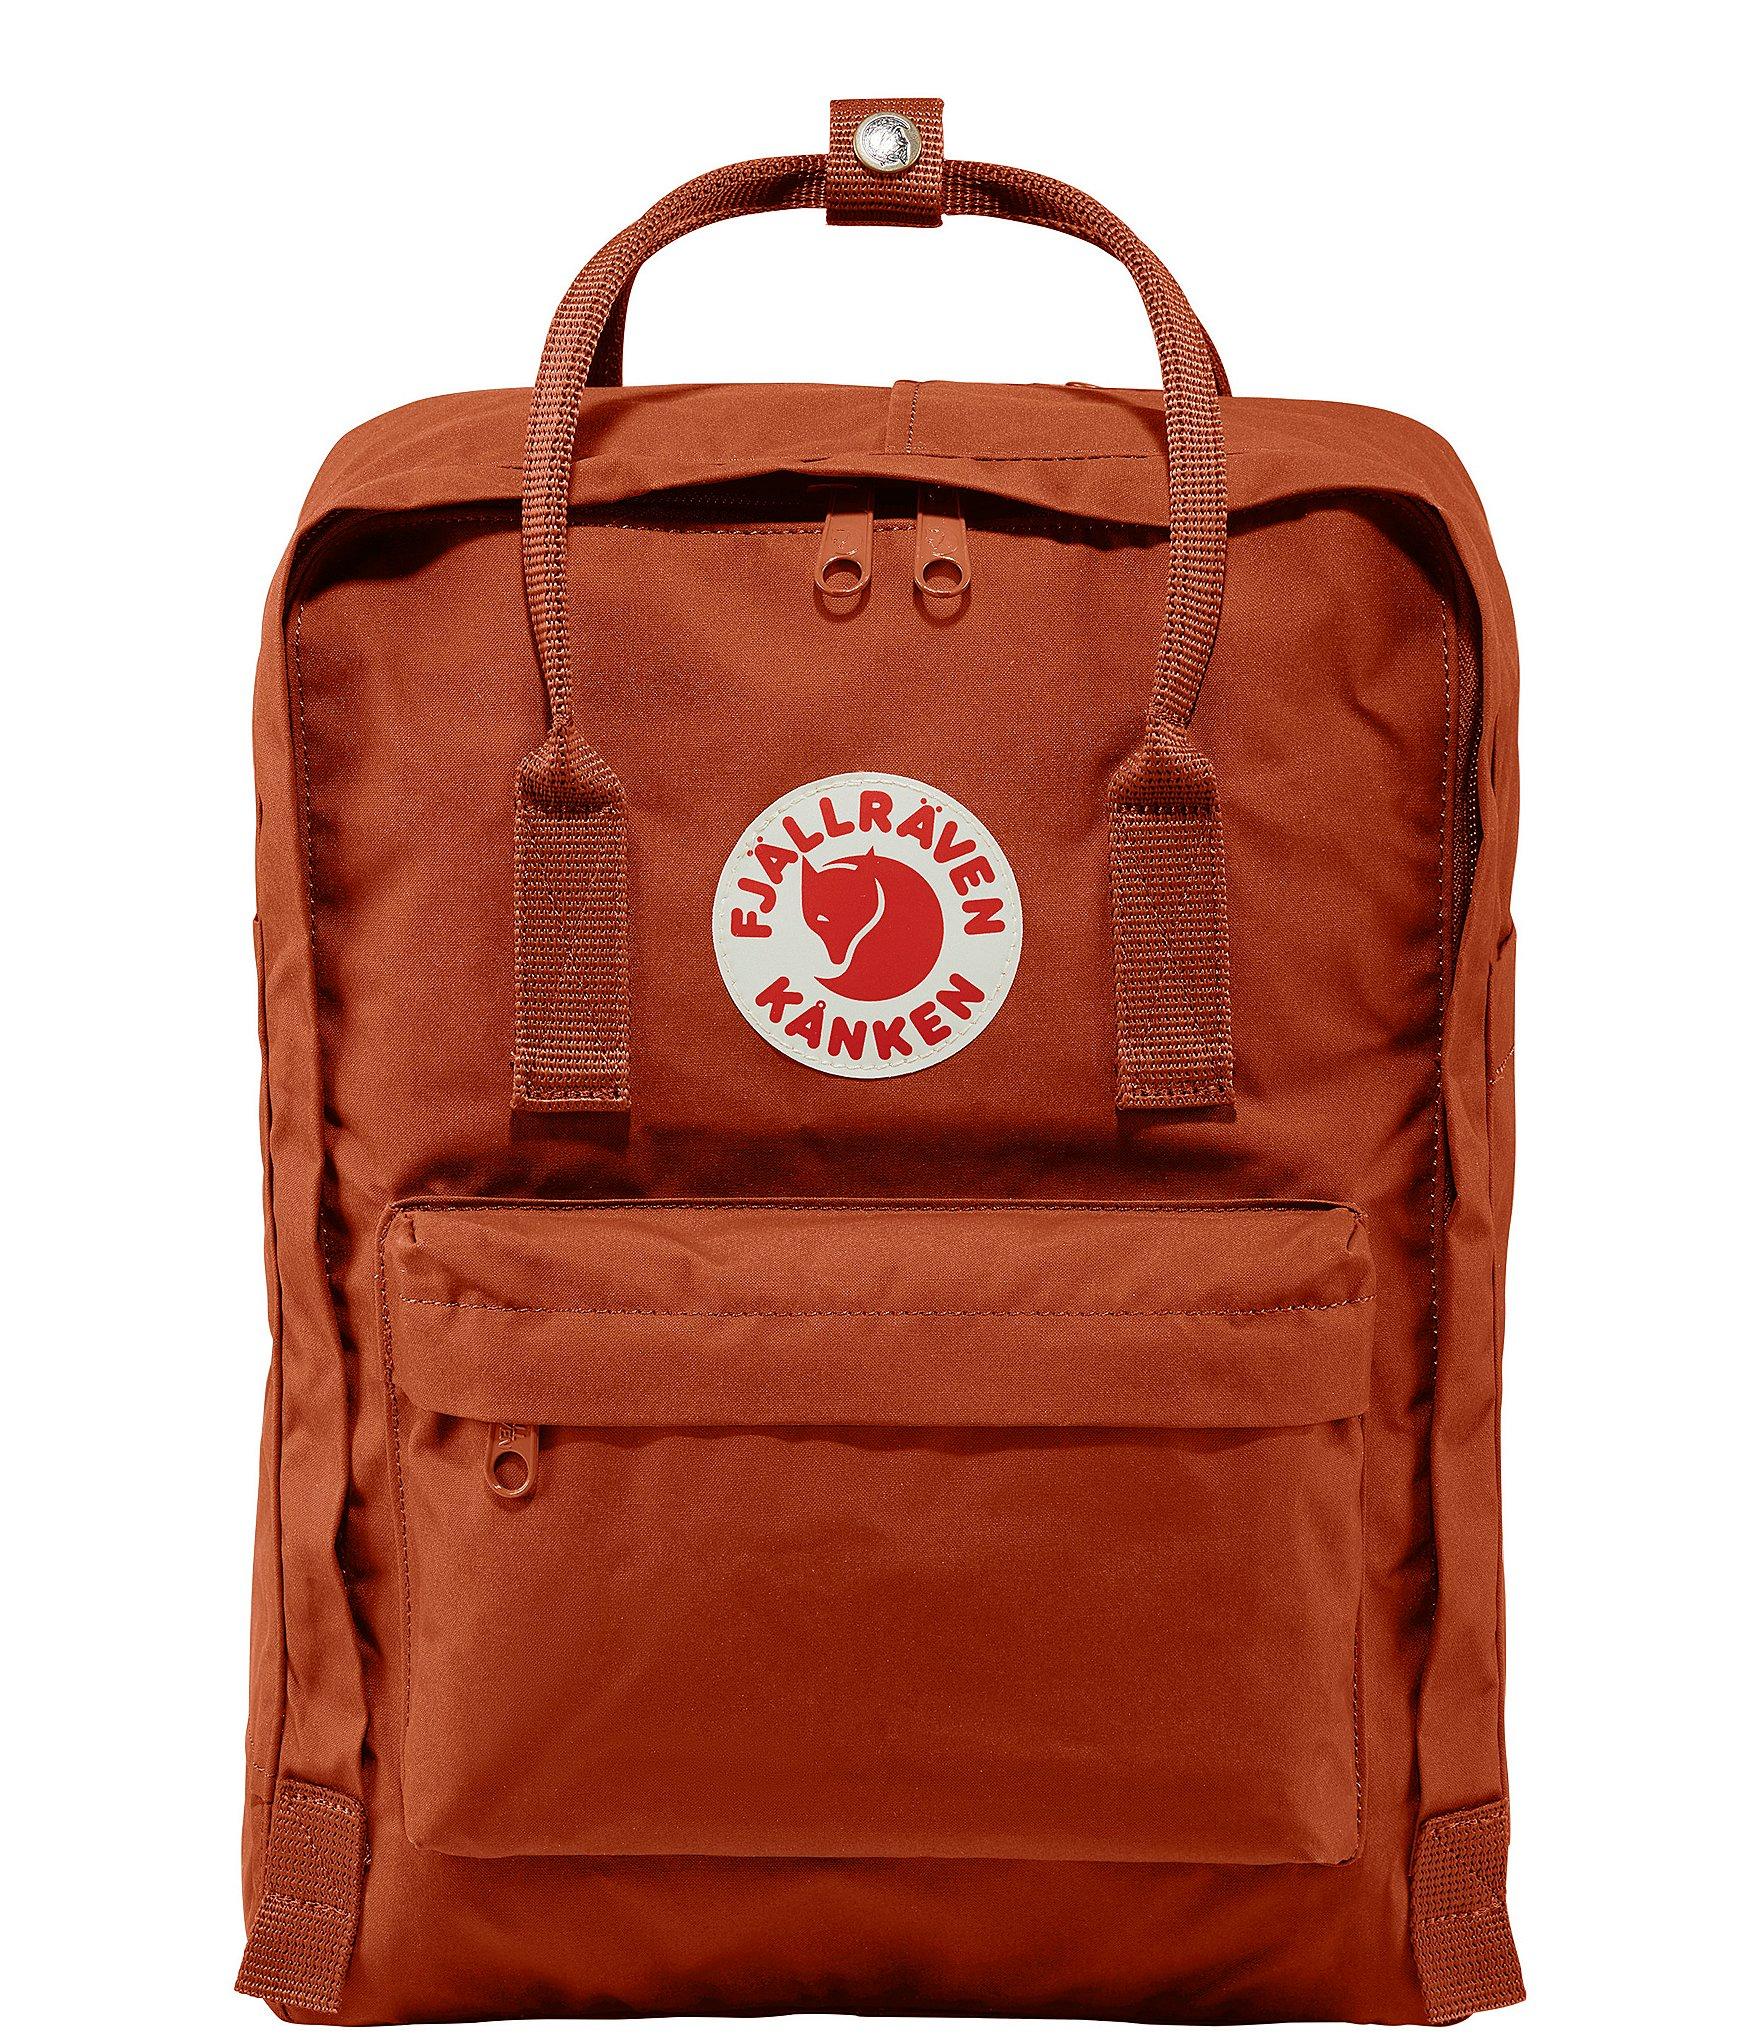 Fjallraven Kanken Water Resistant Backpack Dillards